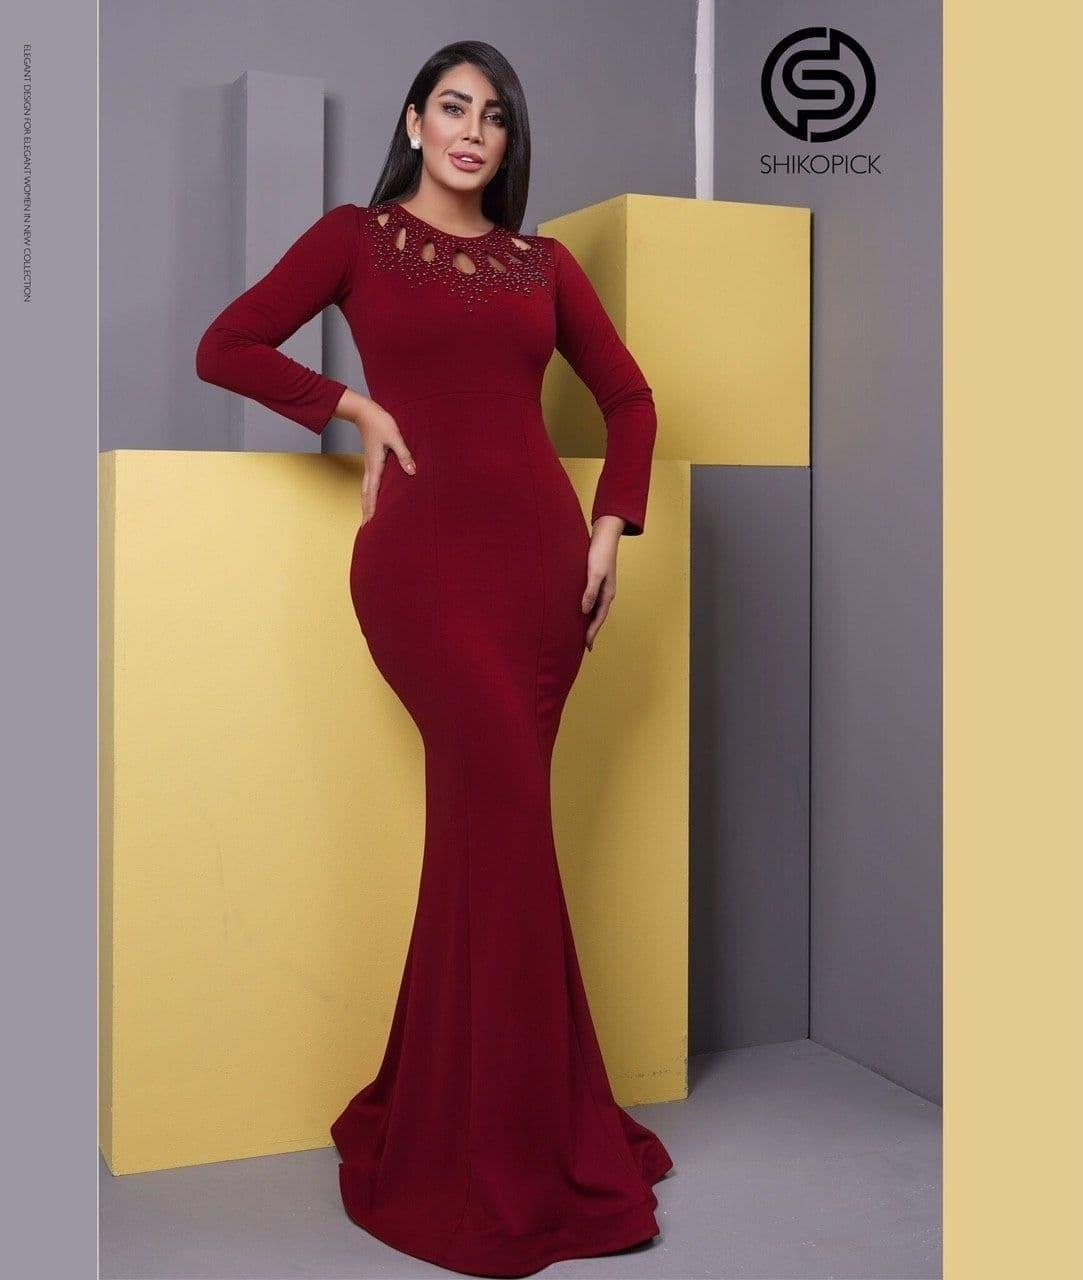 image لباس مجلسی مدل آفتاب